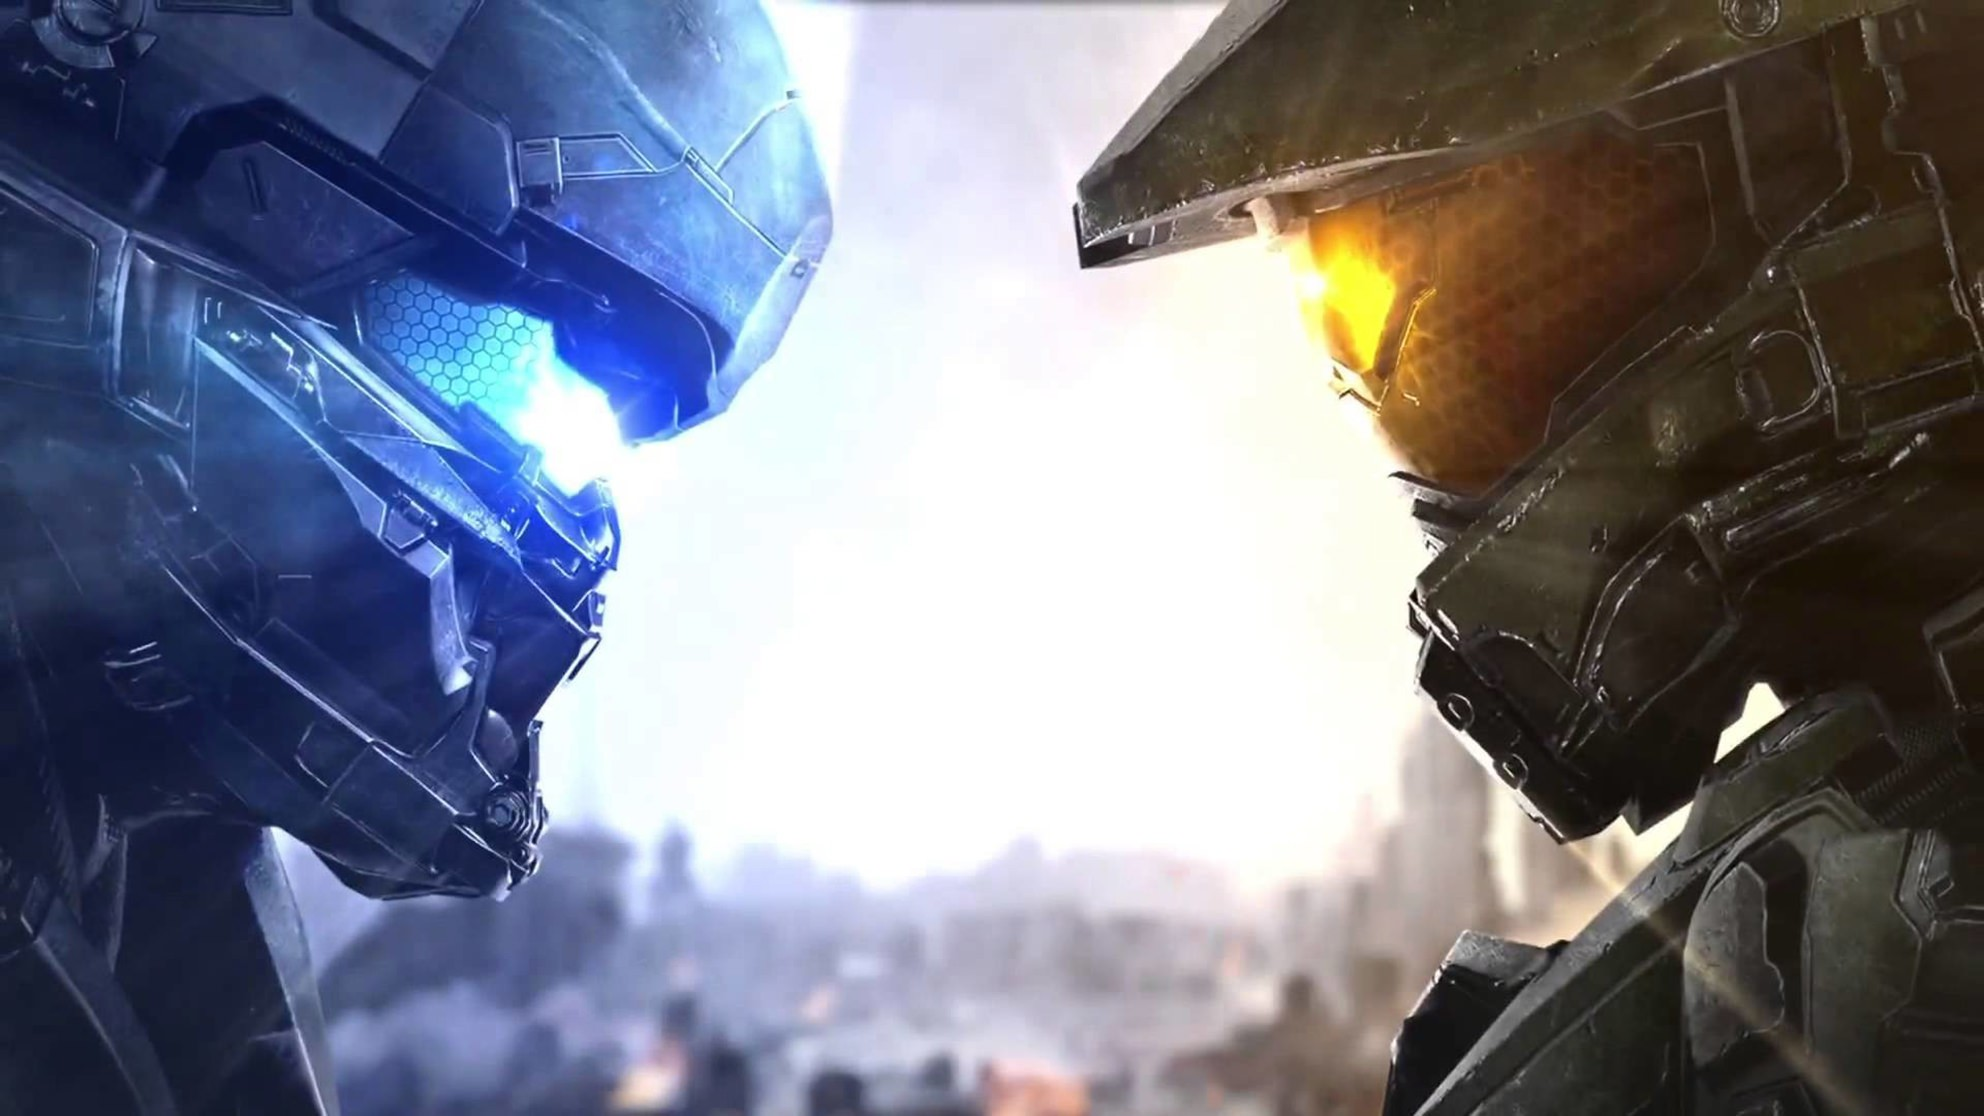 Next Halo game might be bad, says Ninja